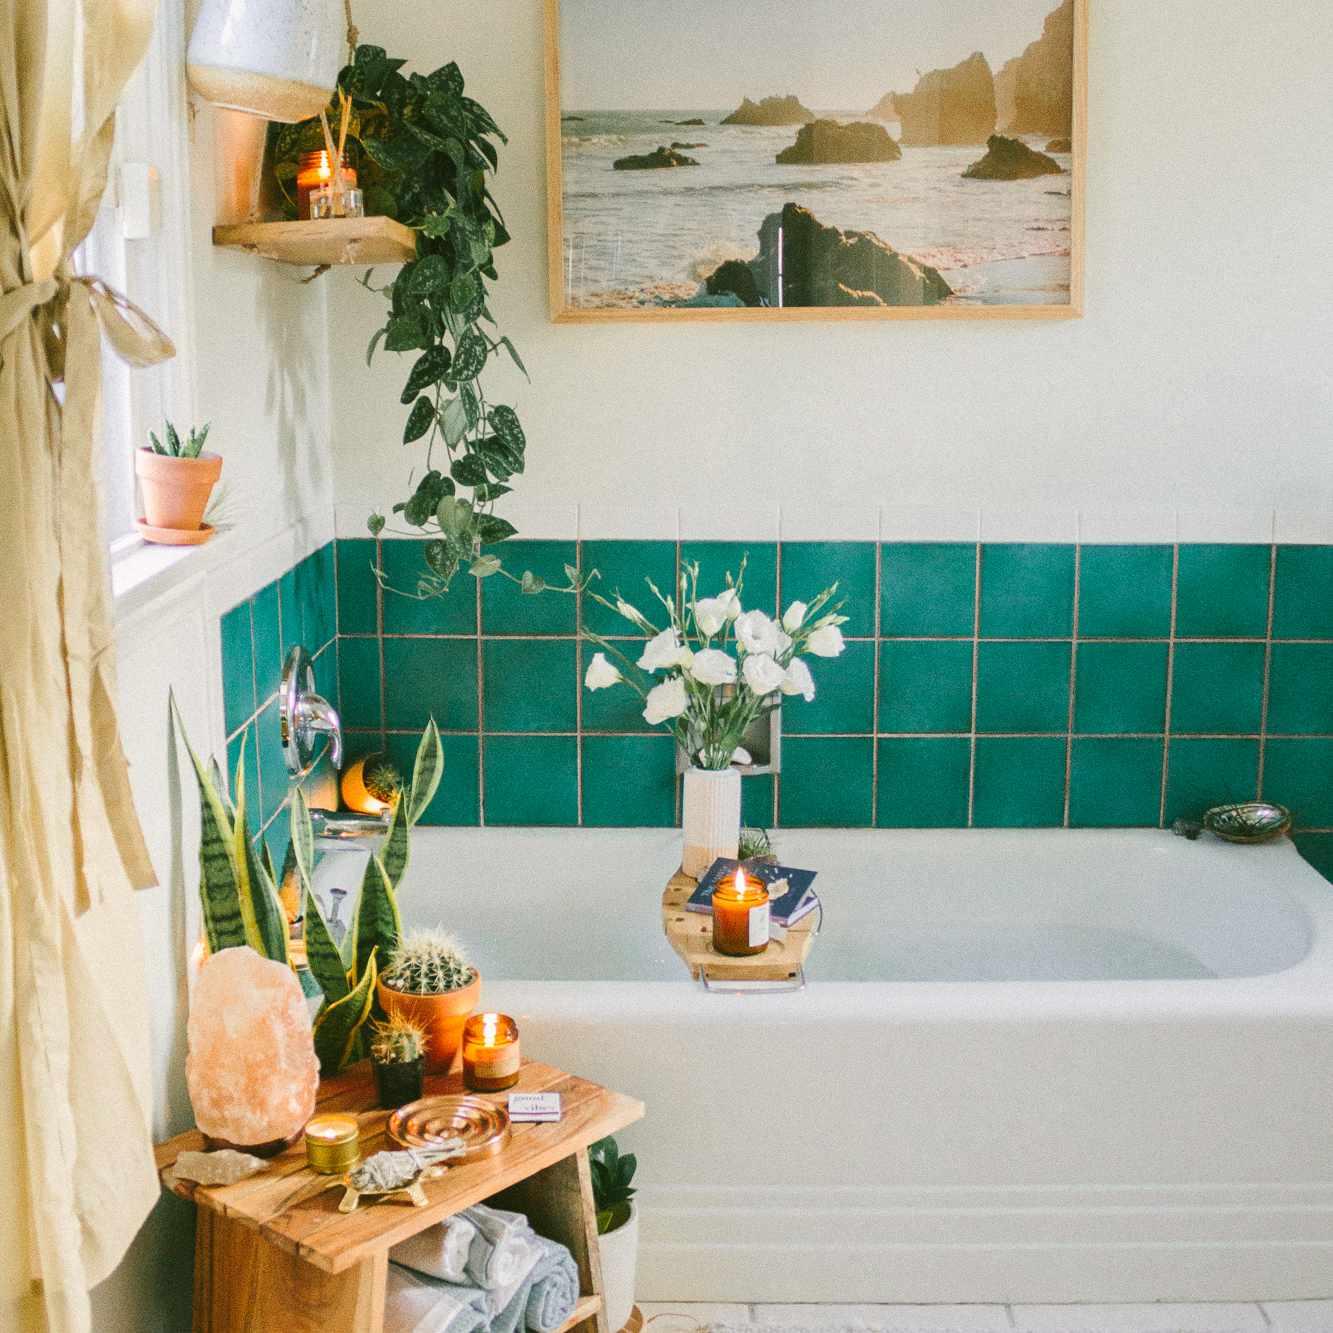 Rental bathroom with updated tiles using vinyl stickers